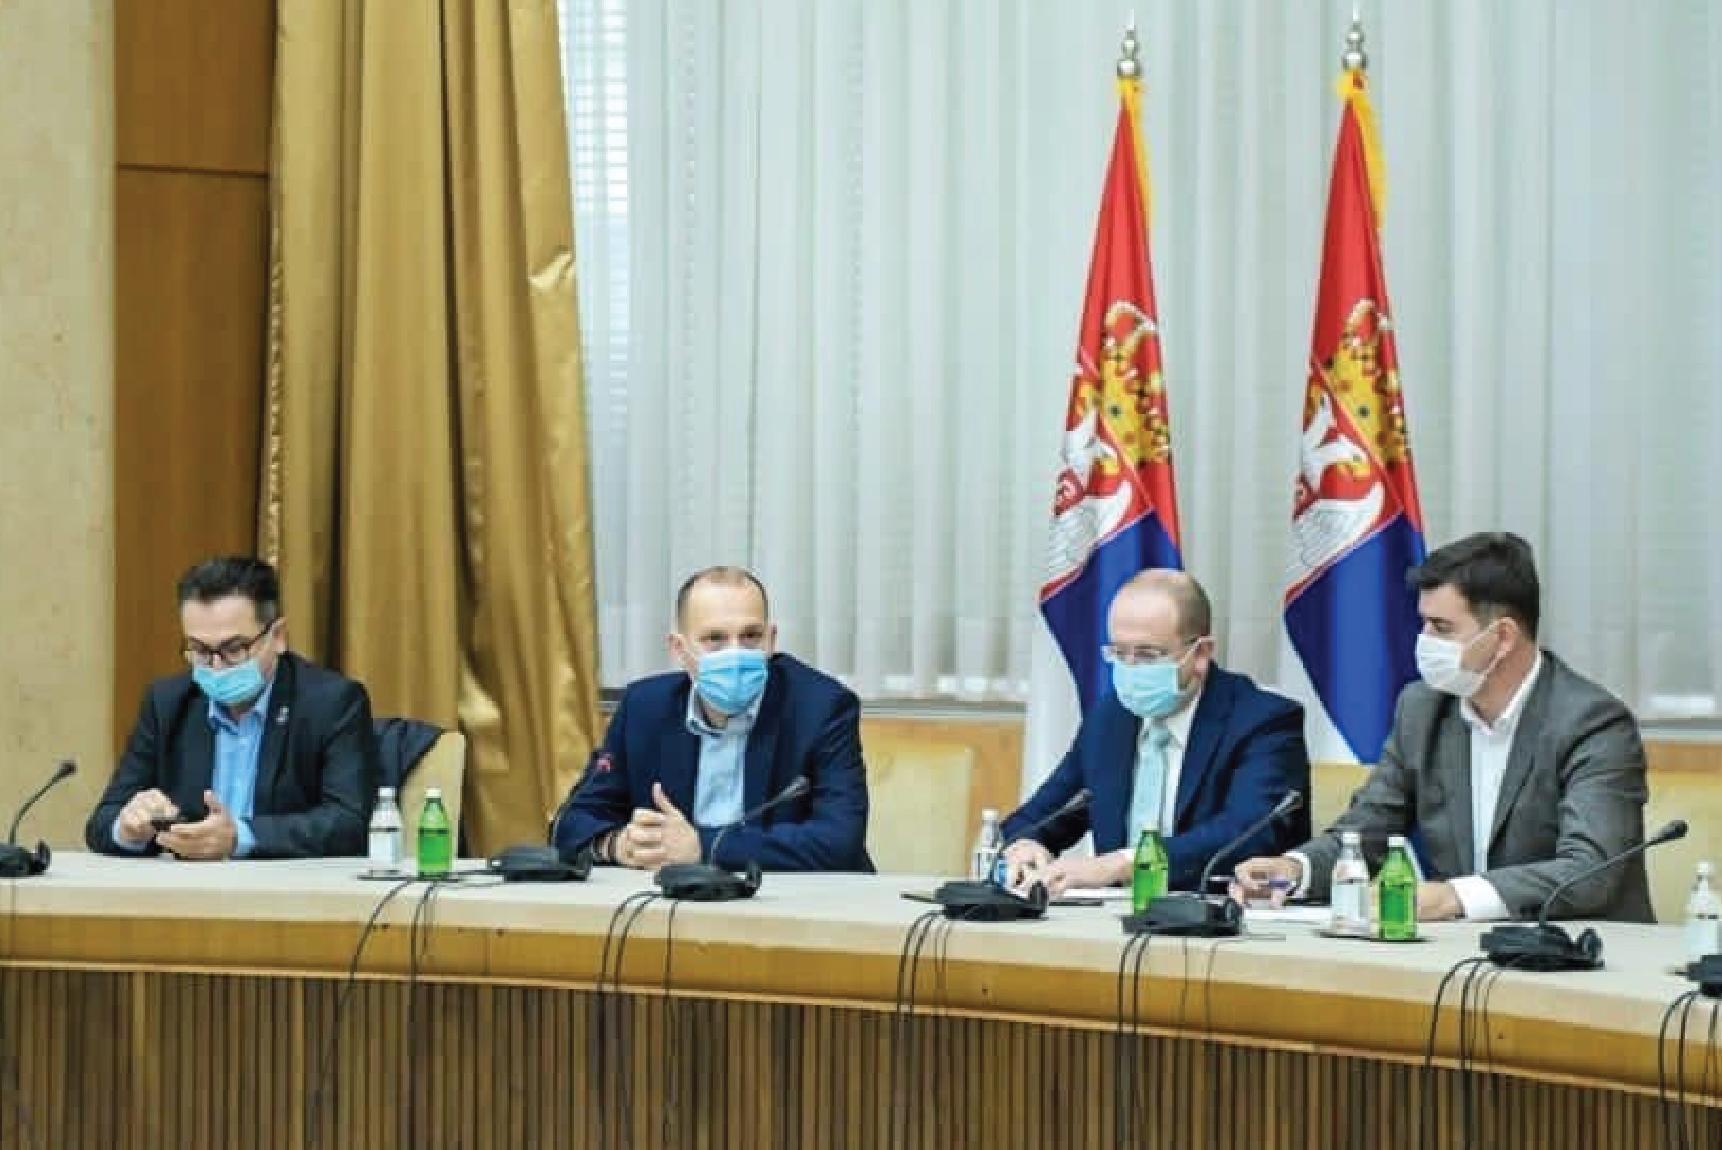 Лончар: Обезбеђено још 500 ковид места у Београду